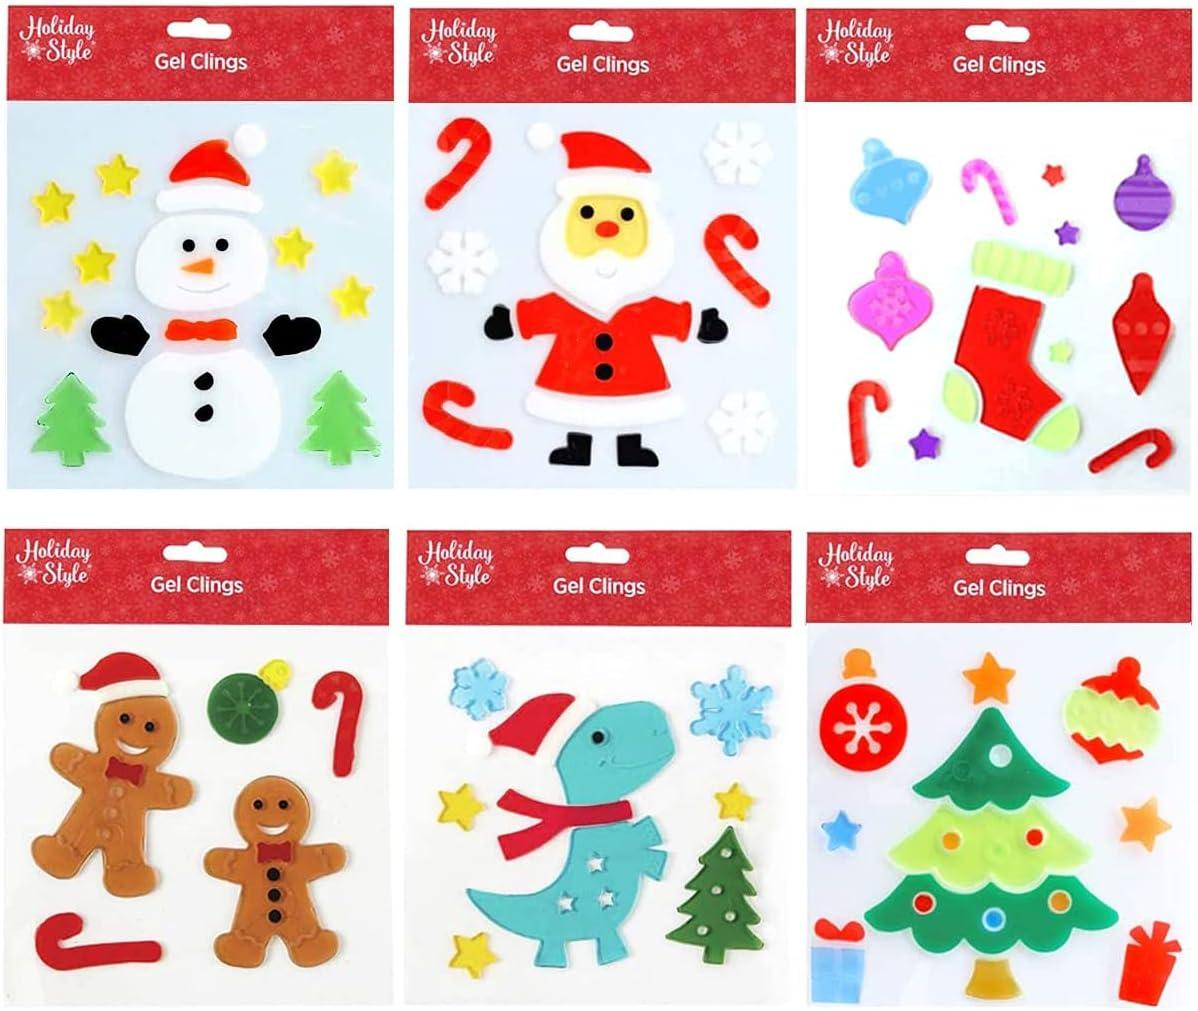 MRTREUP trust Christmas Trust Window Gel Cling Happy Decorations H